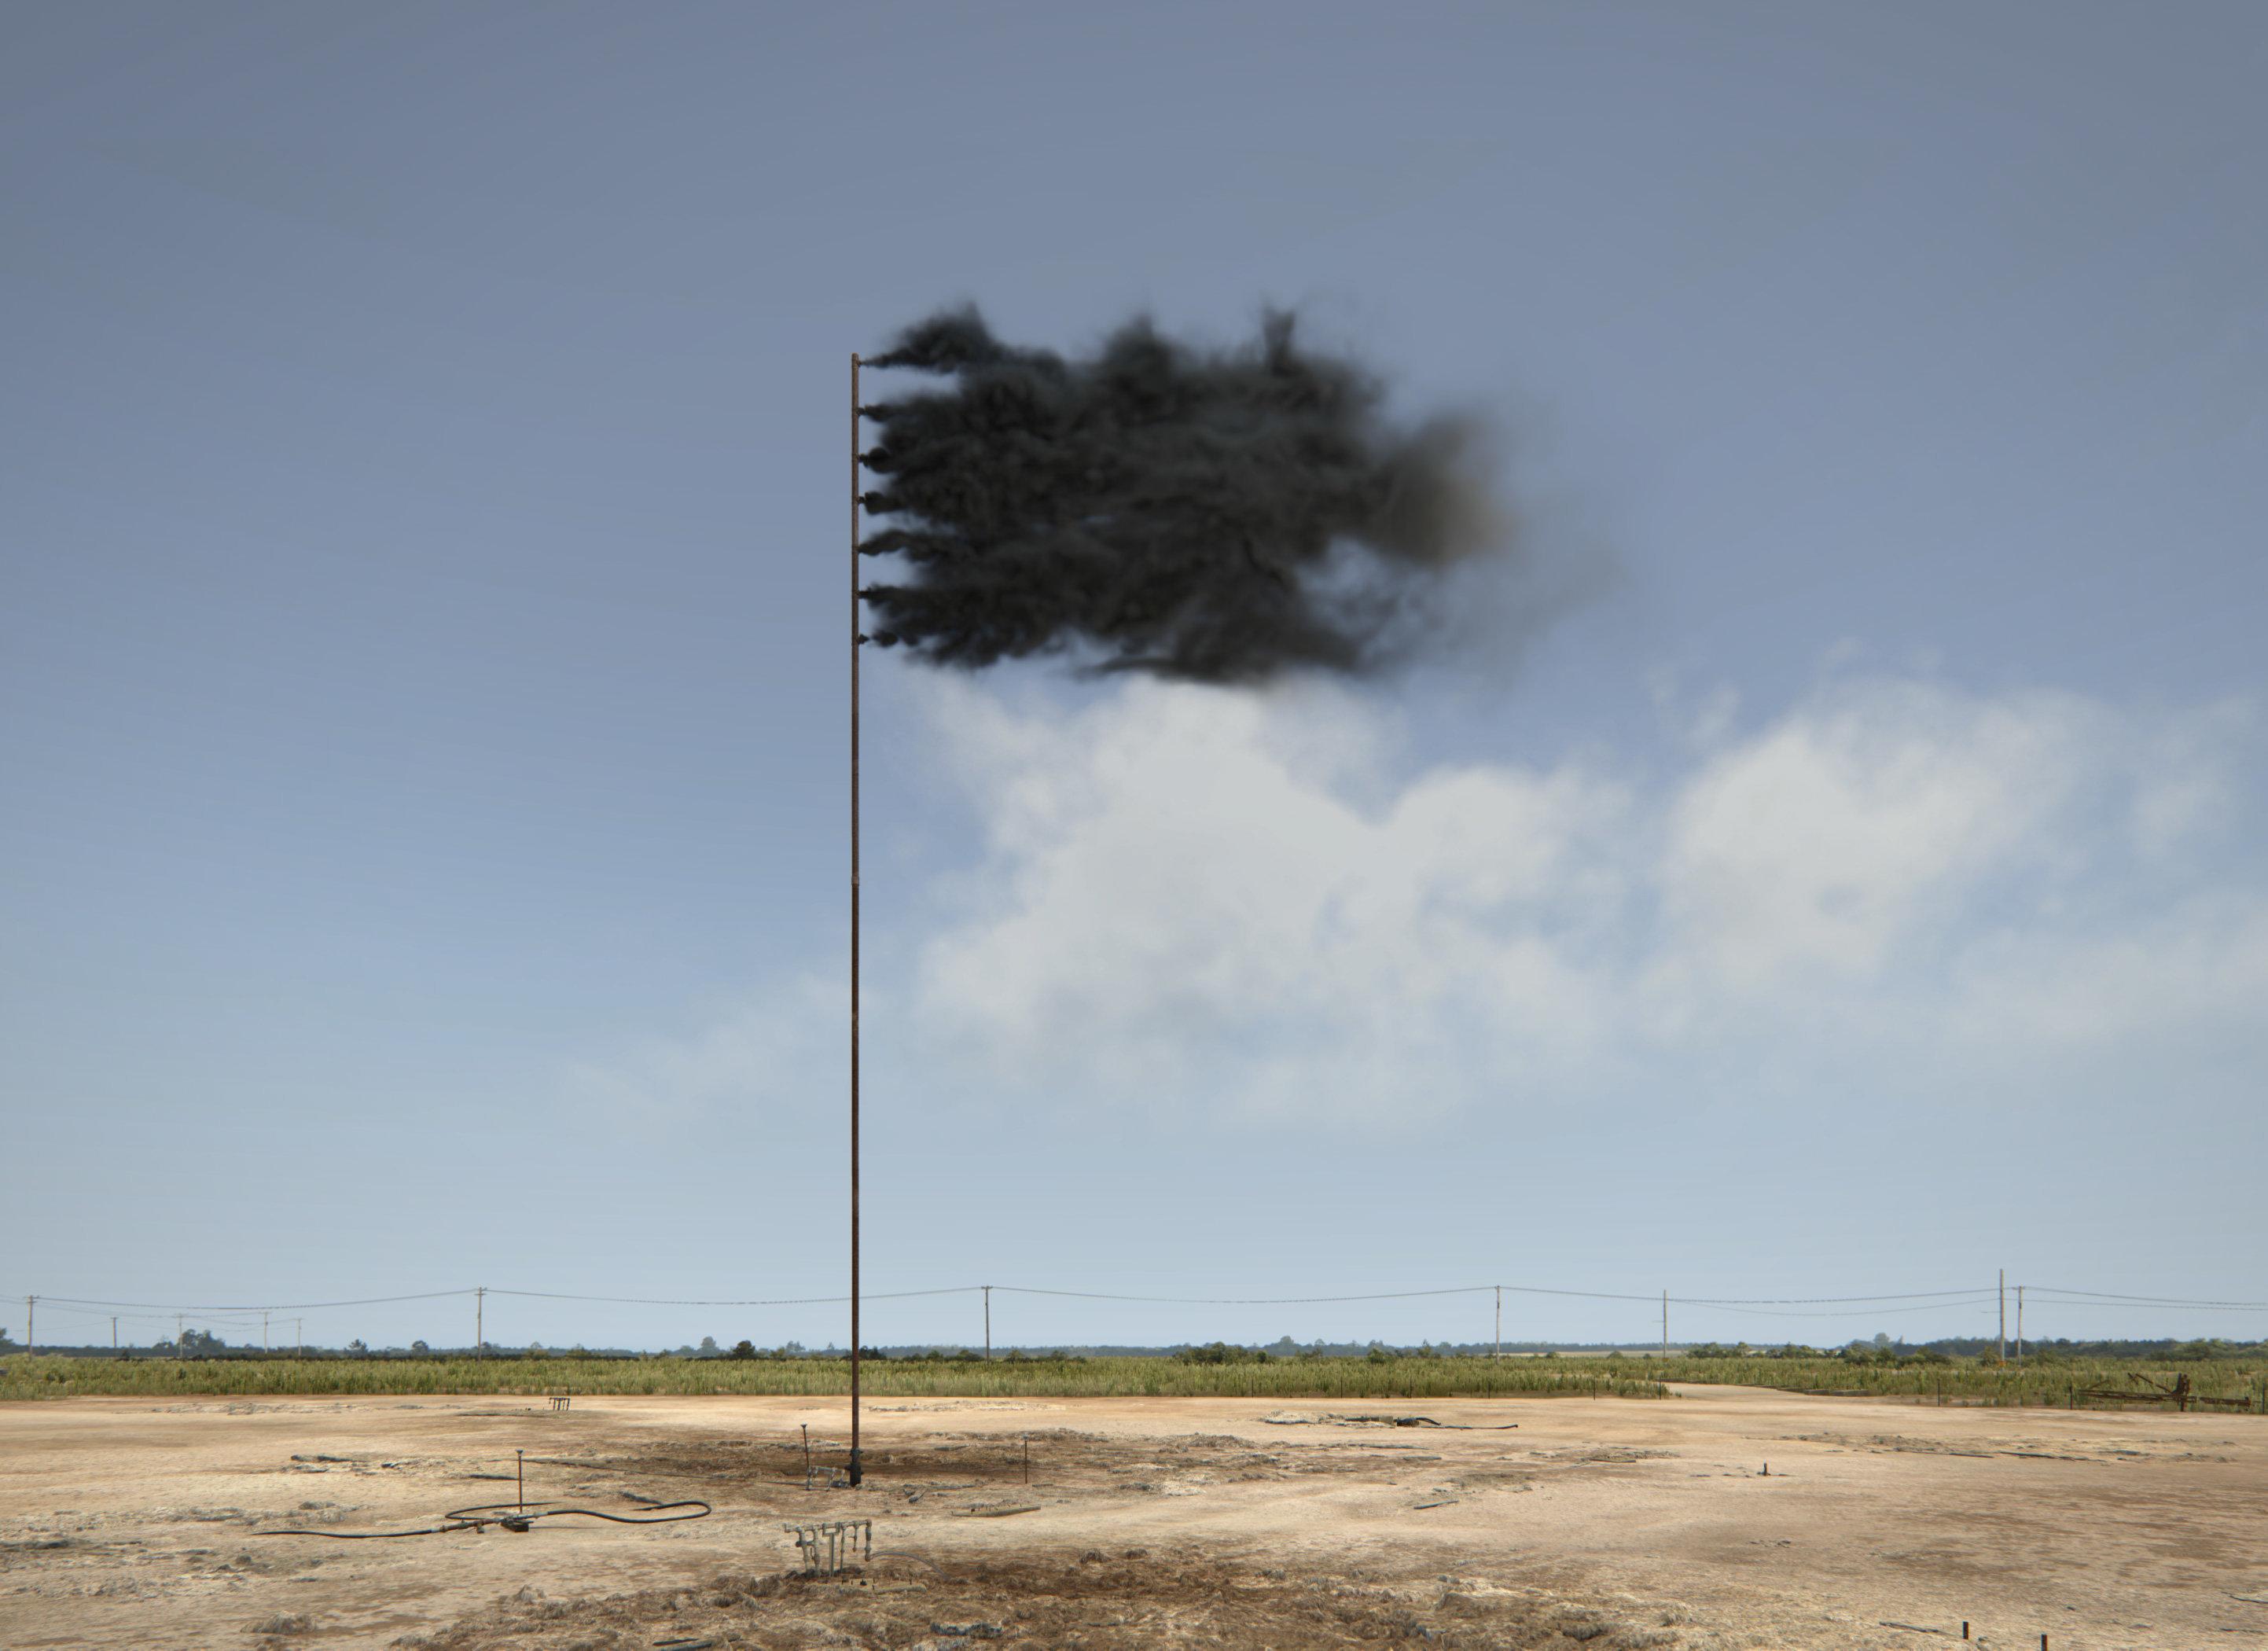 Western Flag (Spindletop, Texas 2017), a virtual art installation by Irish artist John Gerrard, uses...